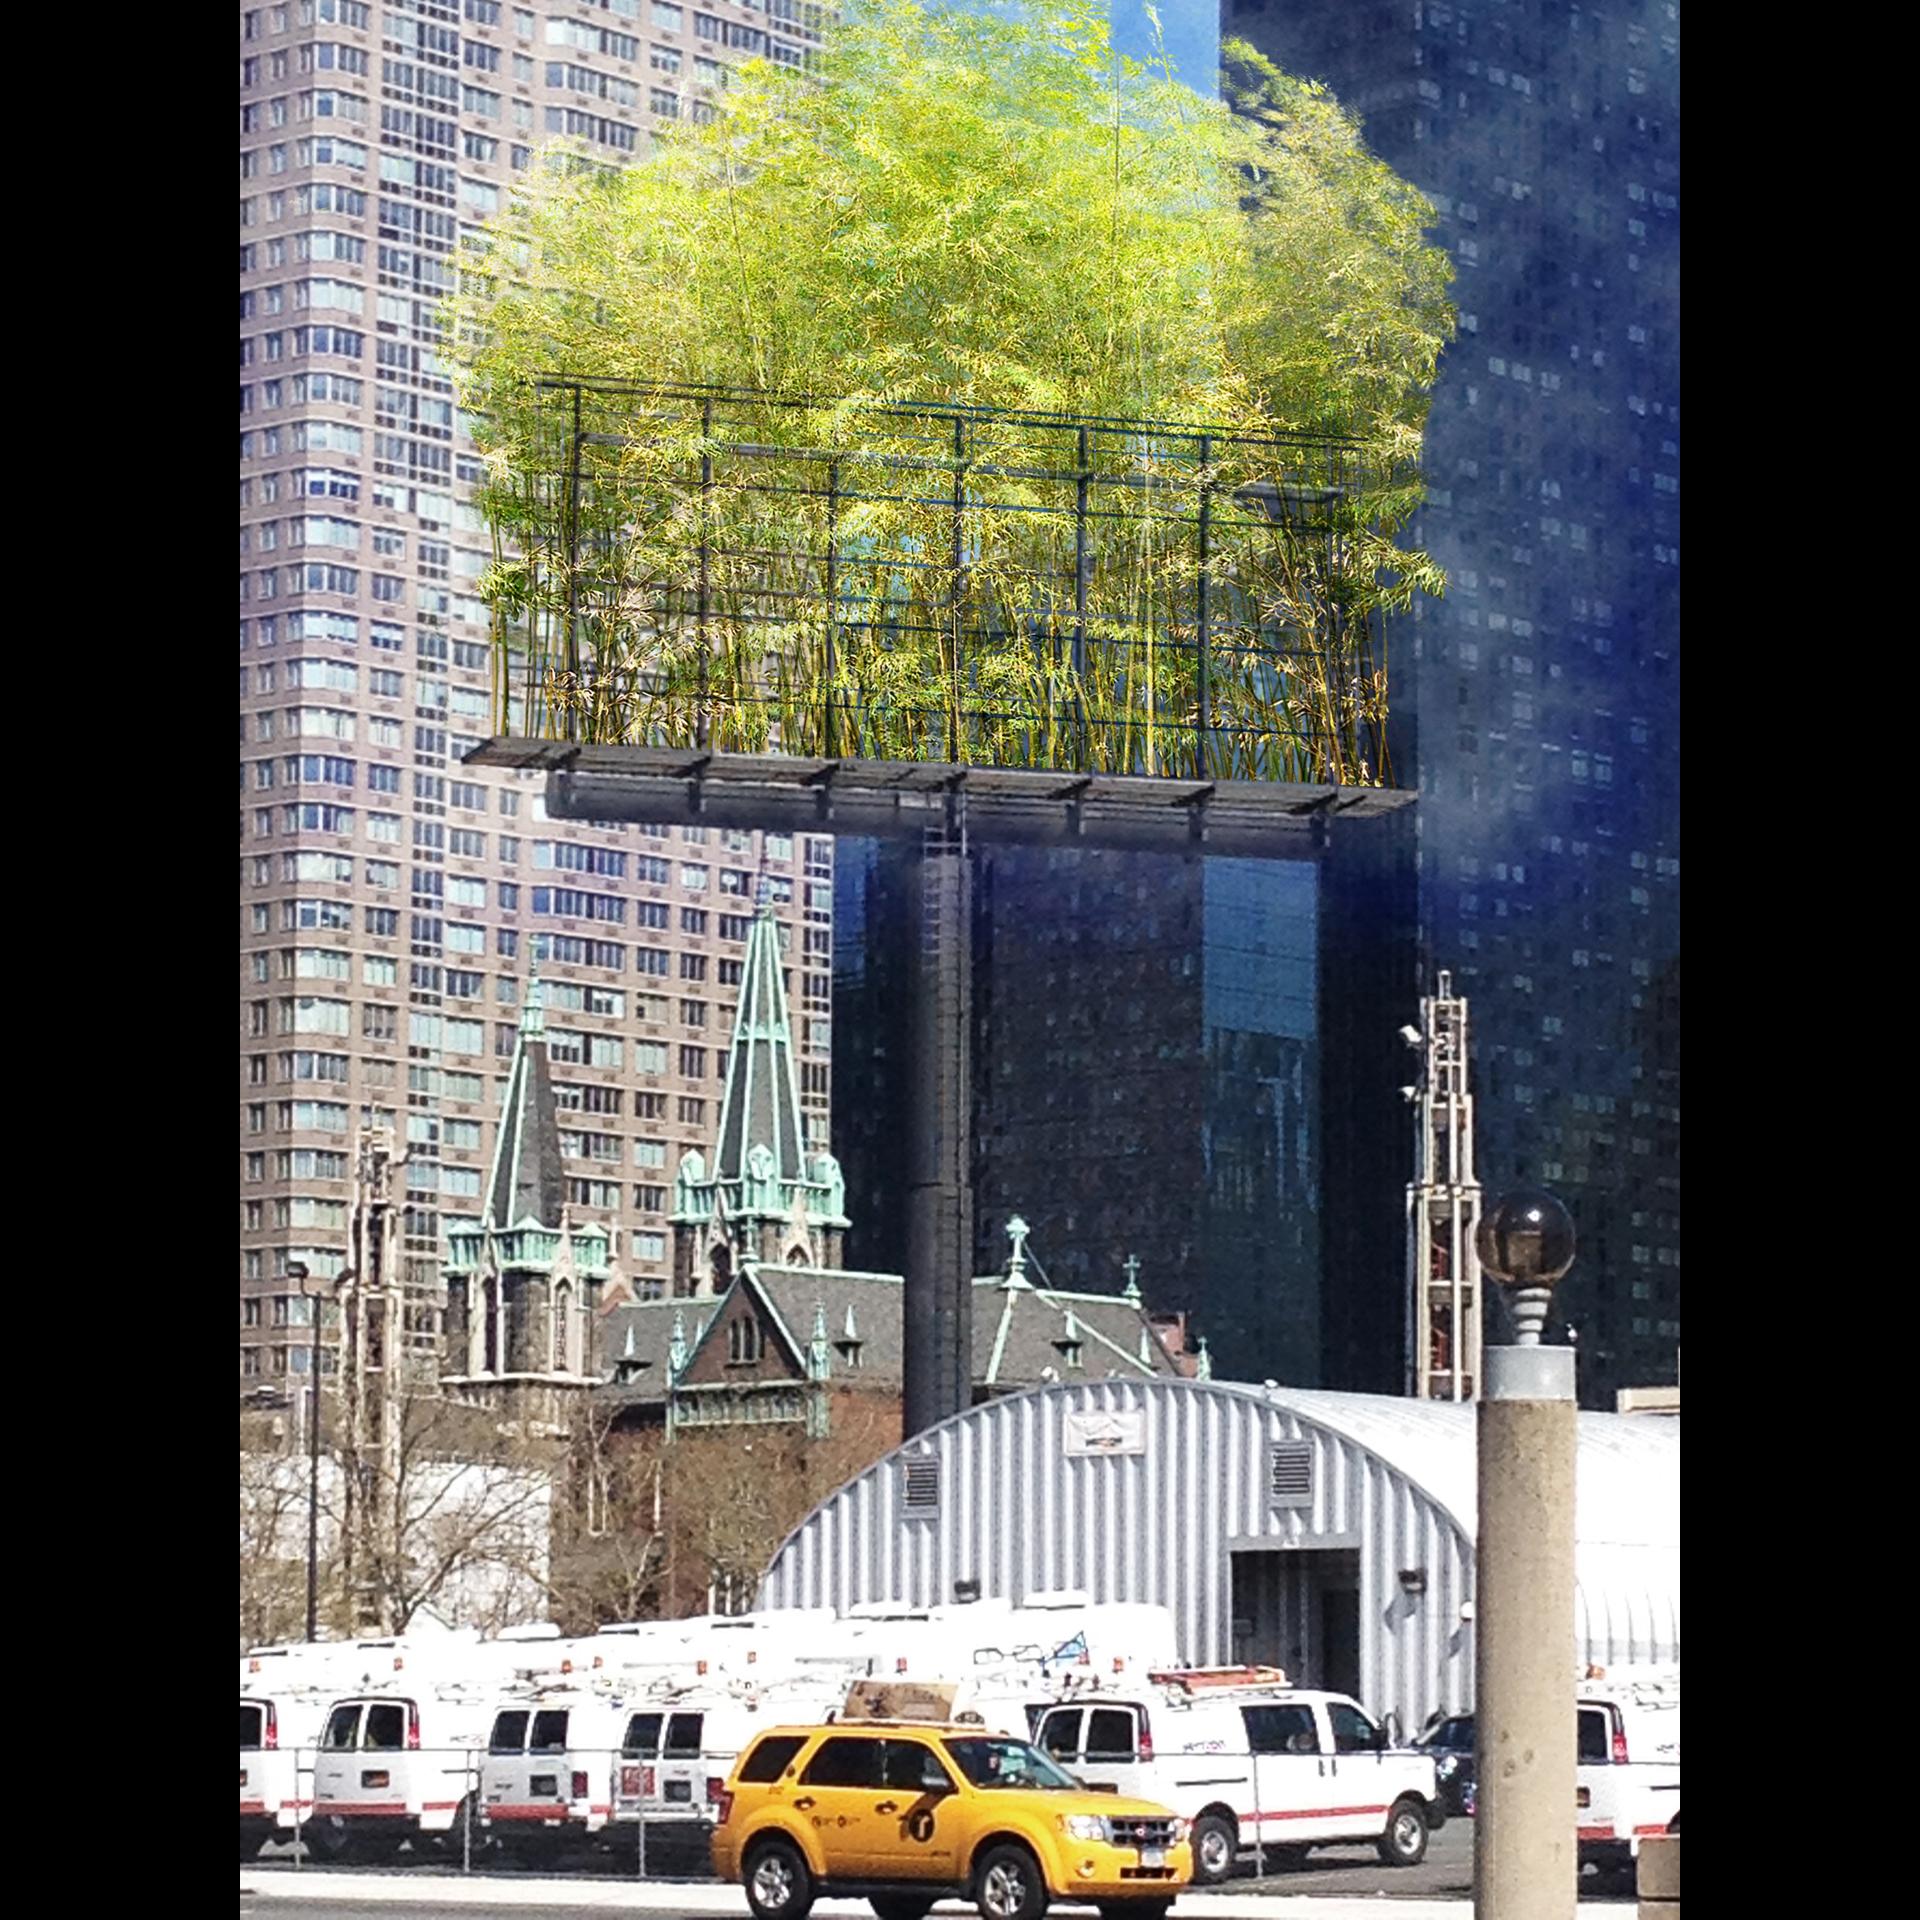 S.E.A.-Studio-Environmental-Architecture-David-Hertz-FAIA-Stephen-Glassman-Open-Air-Los-Angeles-sustainable-regenerative-restorative-green-infrastructure-design-bottle-filling-station-upcycle-billboard-advertising-speculative-art-sculpture-bamboo-6.jpg